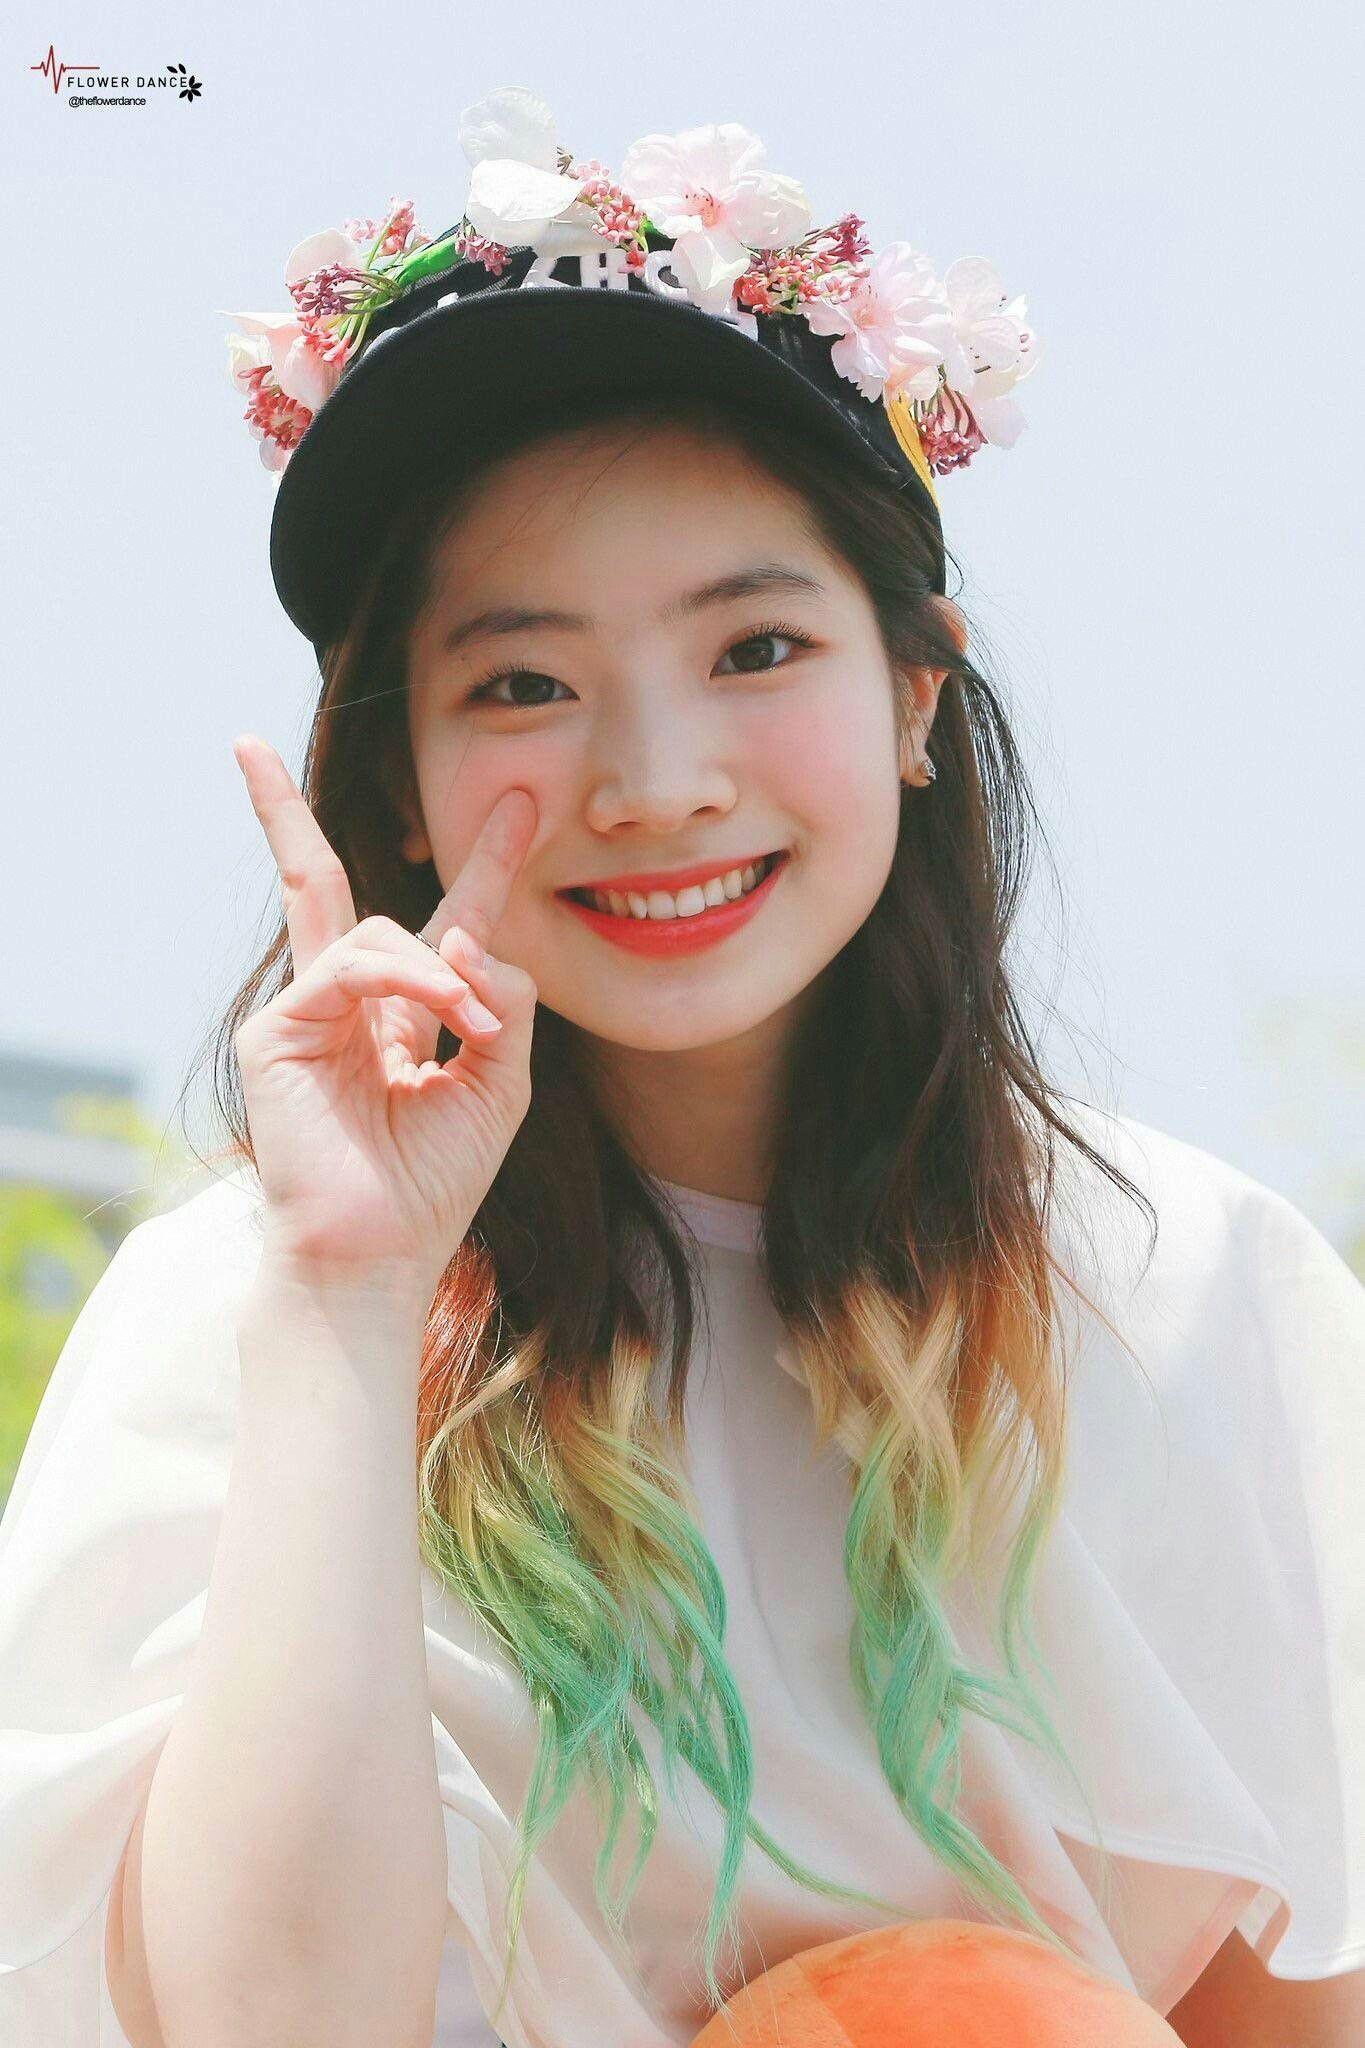 Kim Da-hyun Twice Wallpapers - Wallpaper Cave